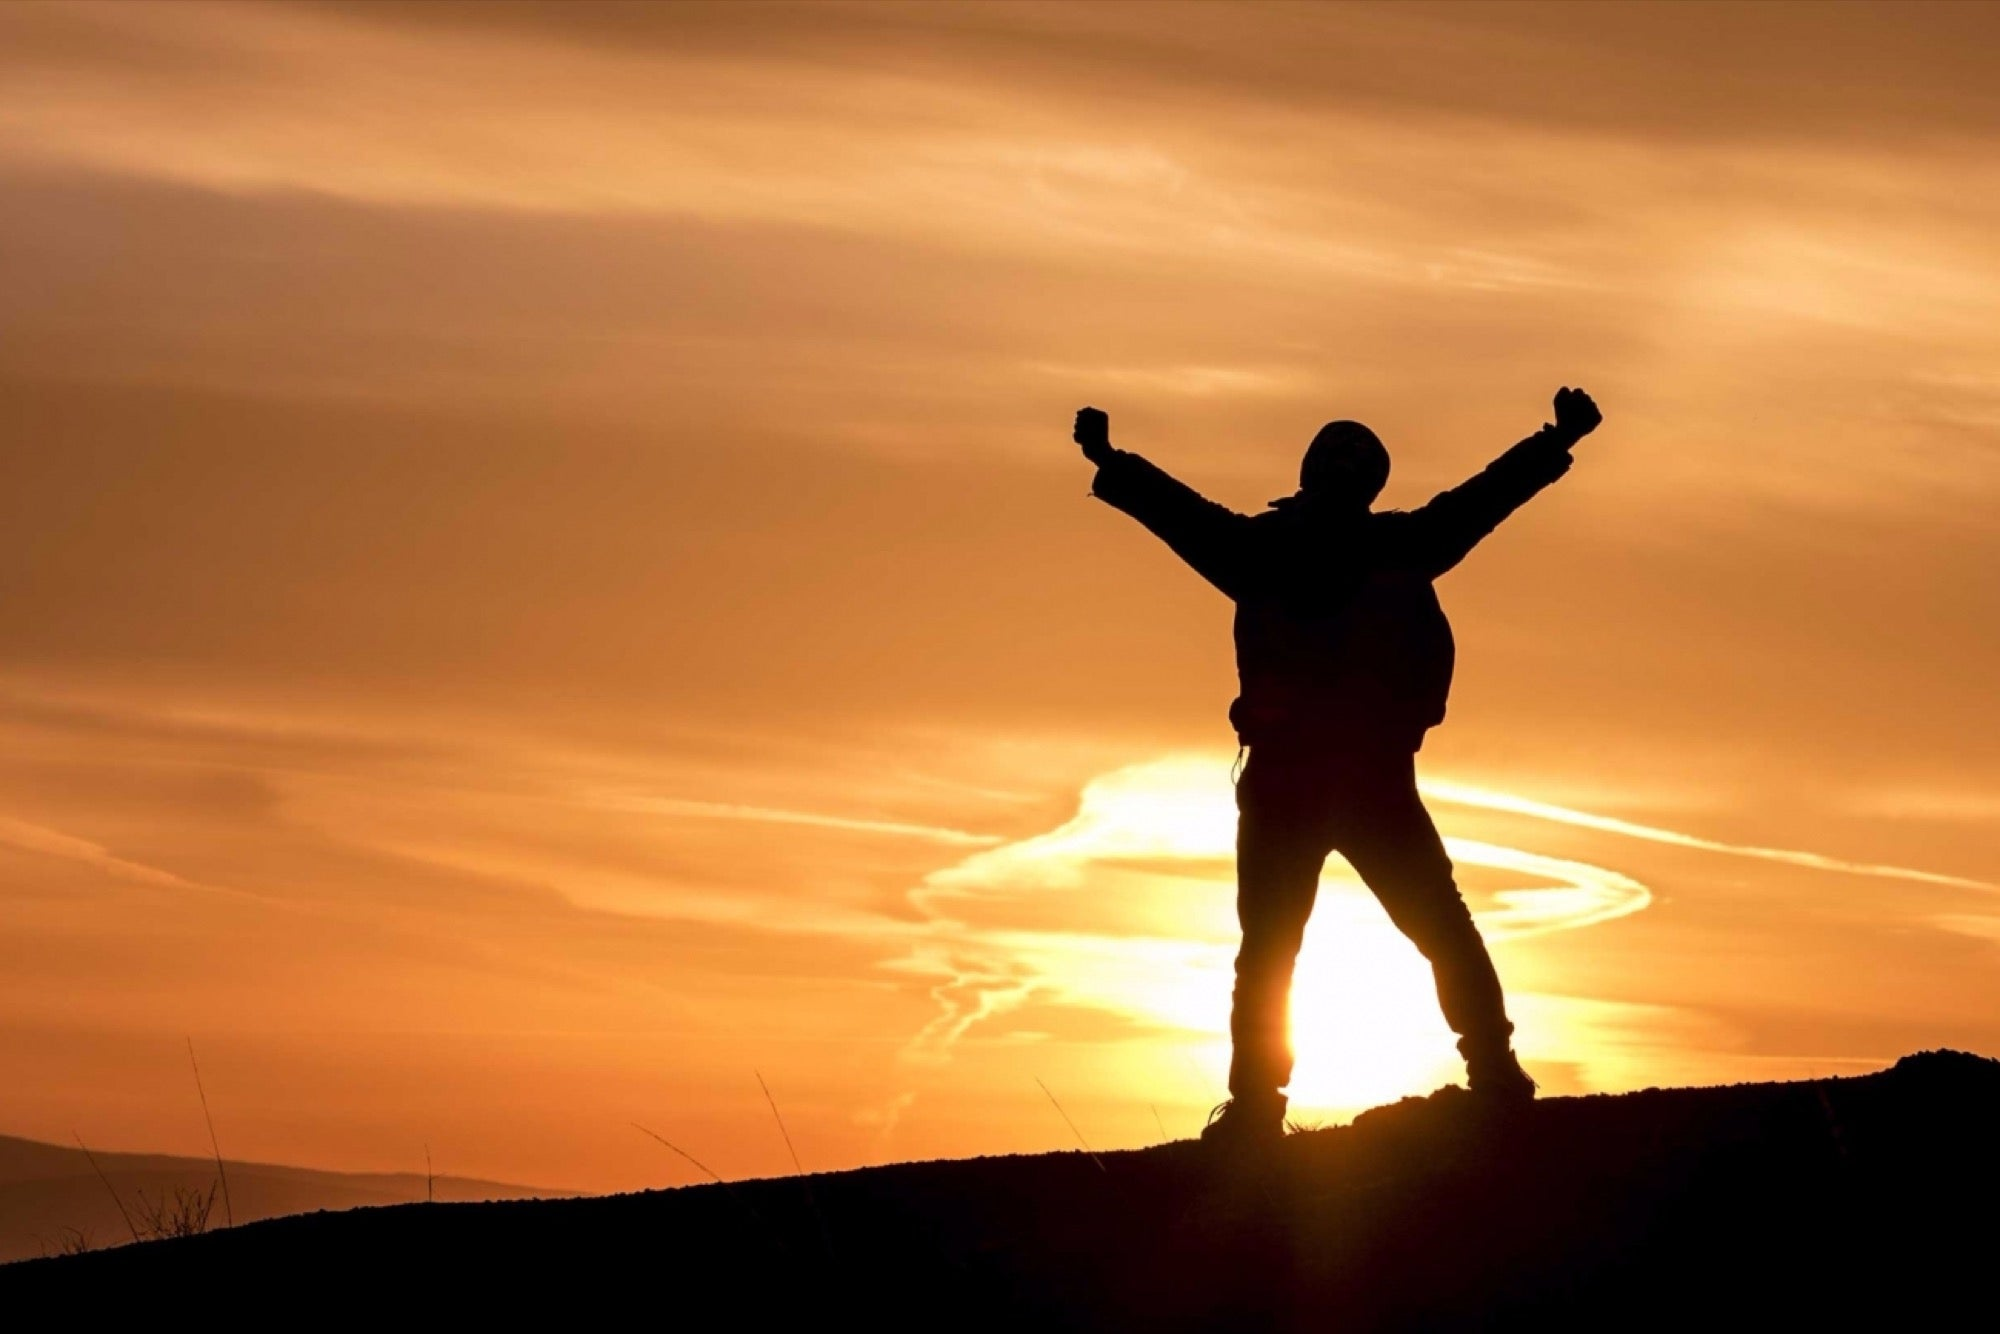 7 ways to turn your life around